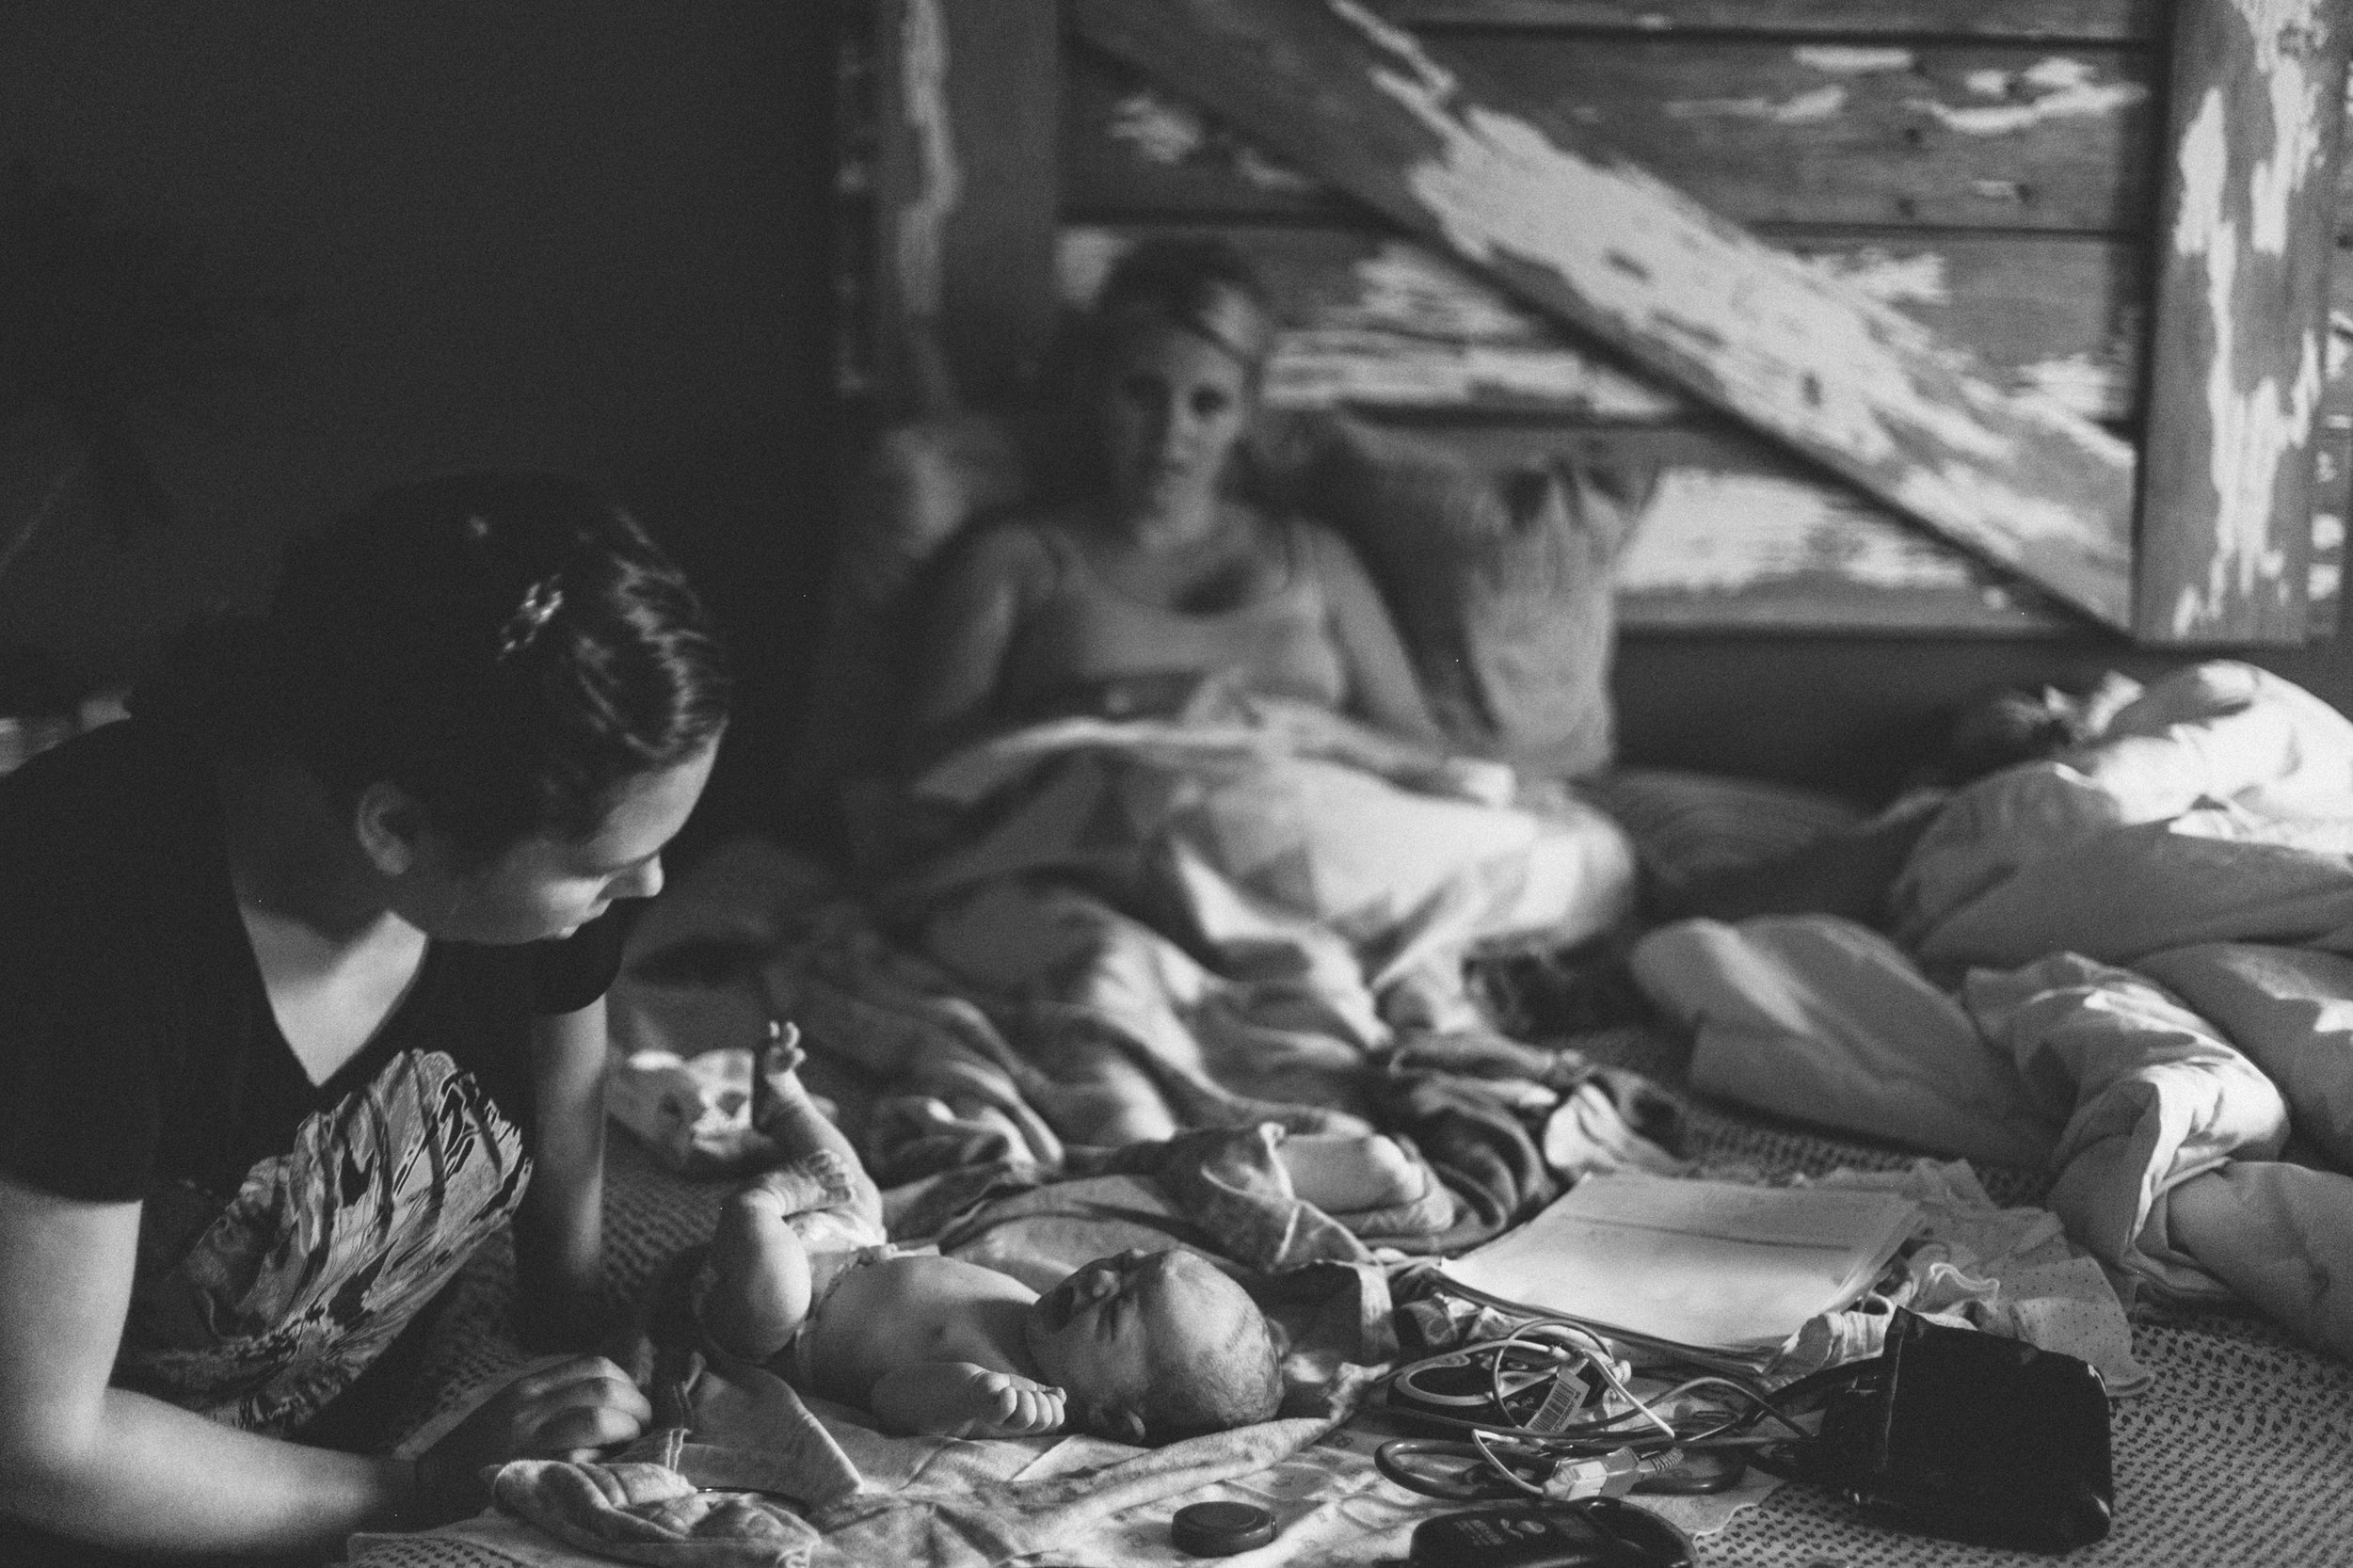 nashville homebirth vbac hbac birth photography